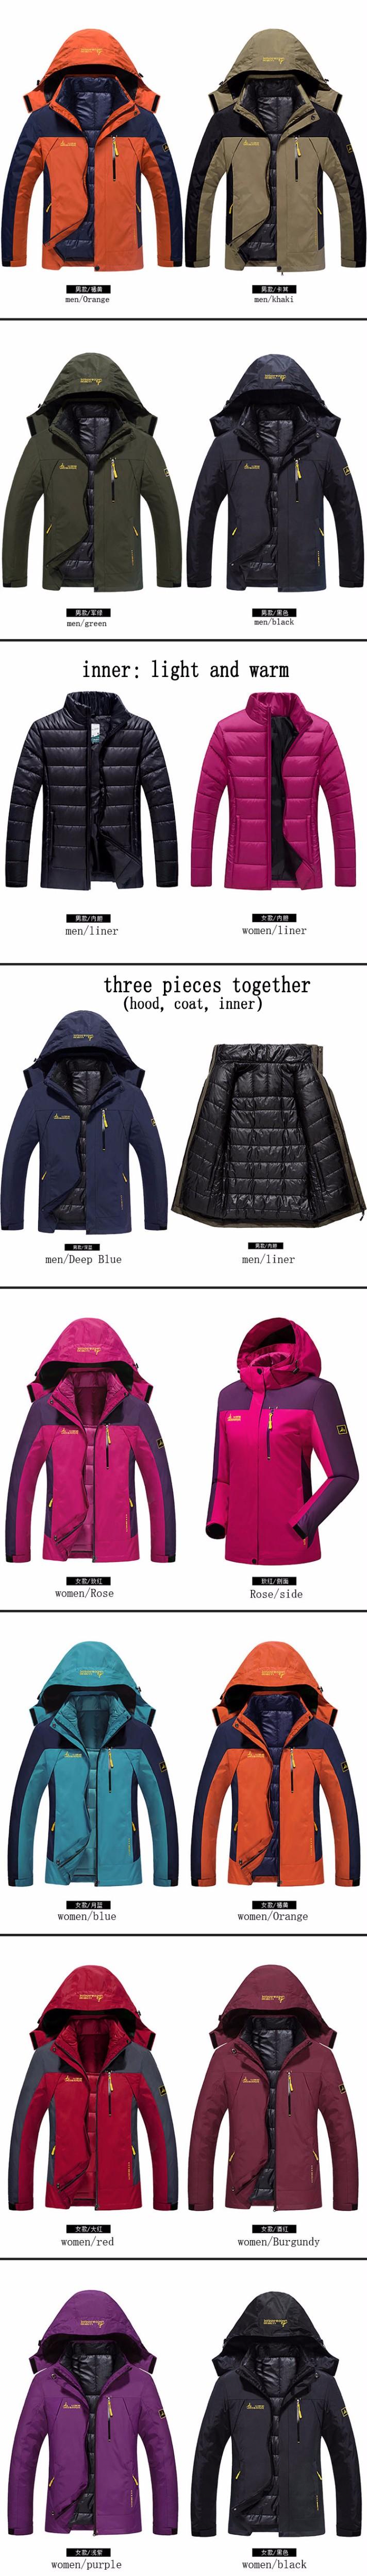 1688pl men women winter jacket 03